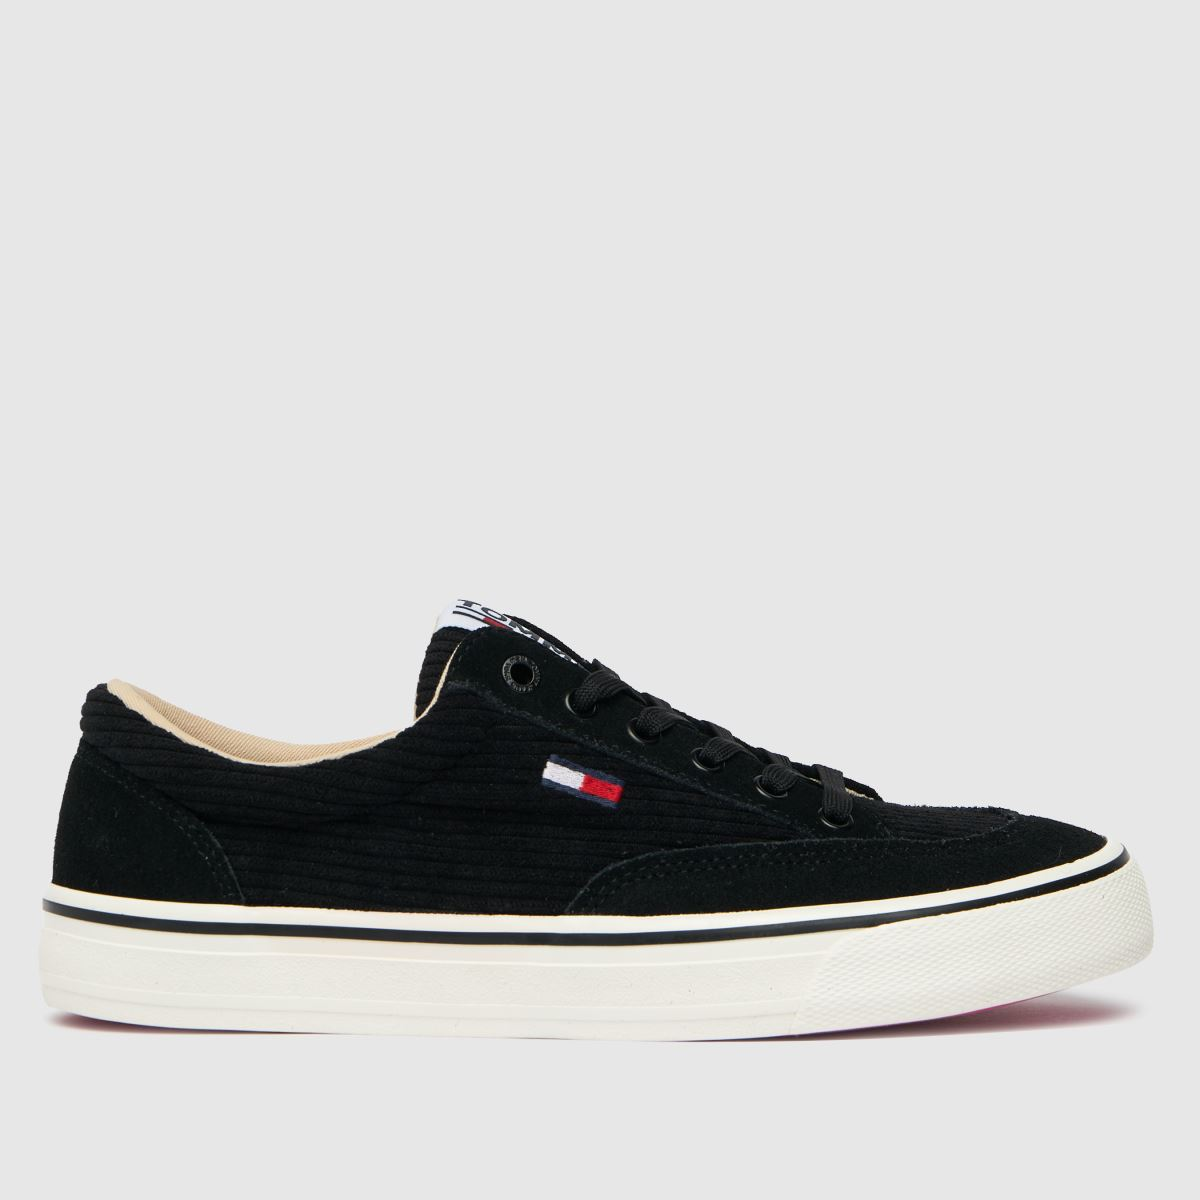 Tommy Hilfiger Black Corduroy Skate Sneaker Trainers